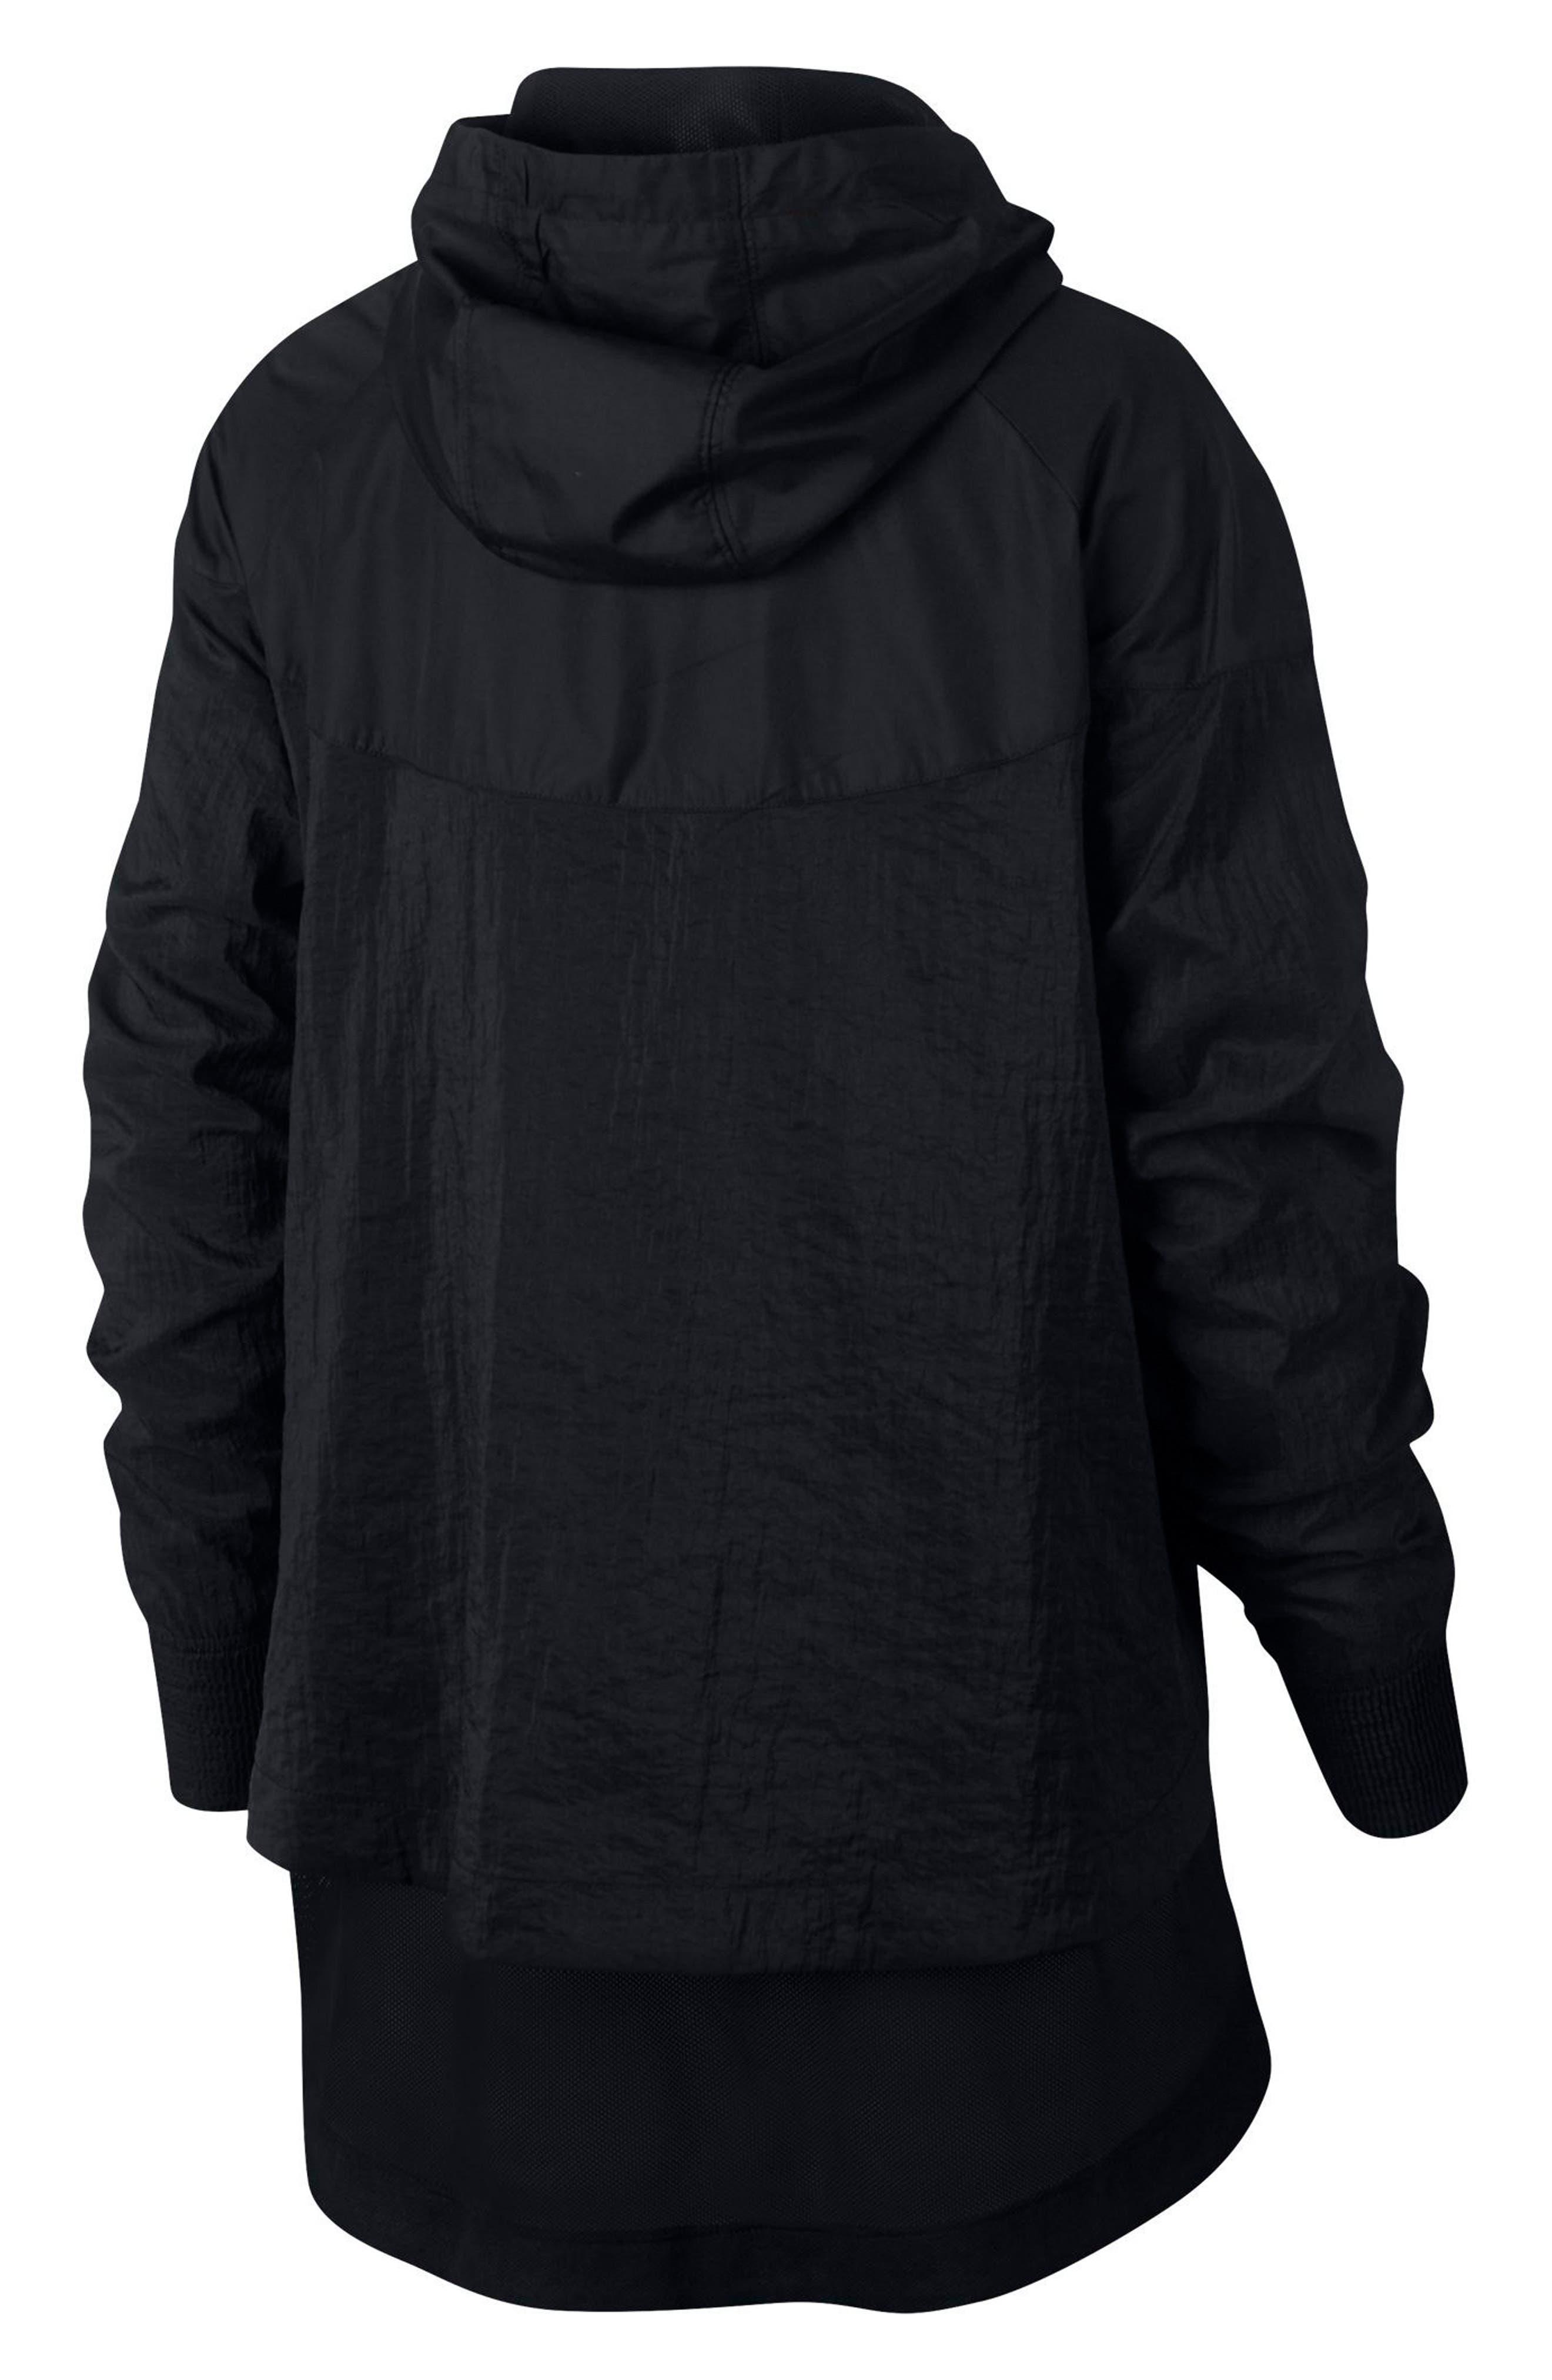 Sportswear Women's Windrunner Water Repellent Jacket,                             Alternate thumbnail 2, color,                             010